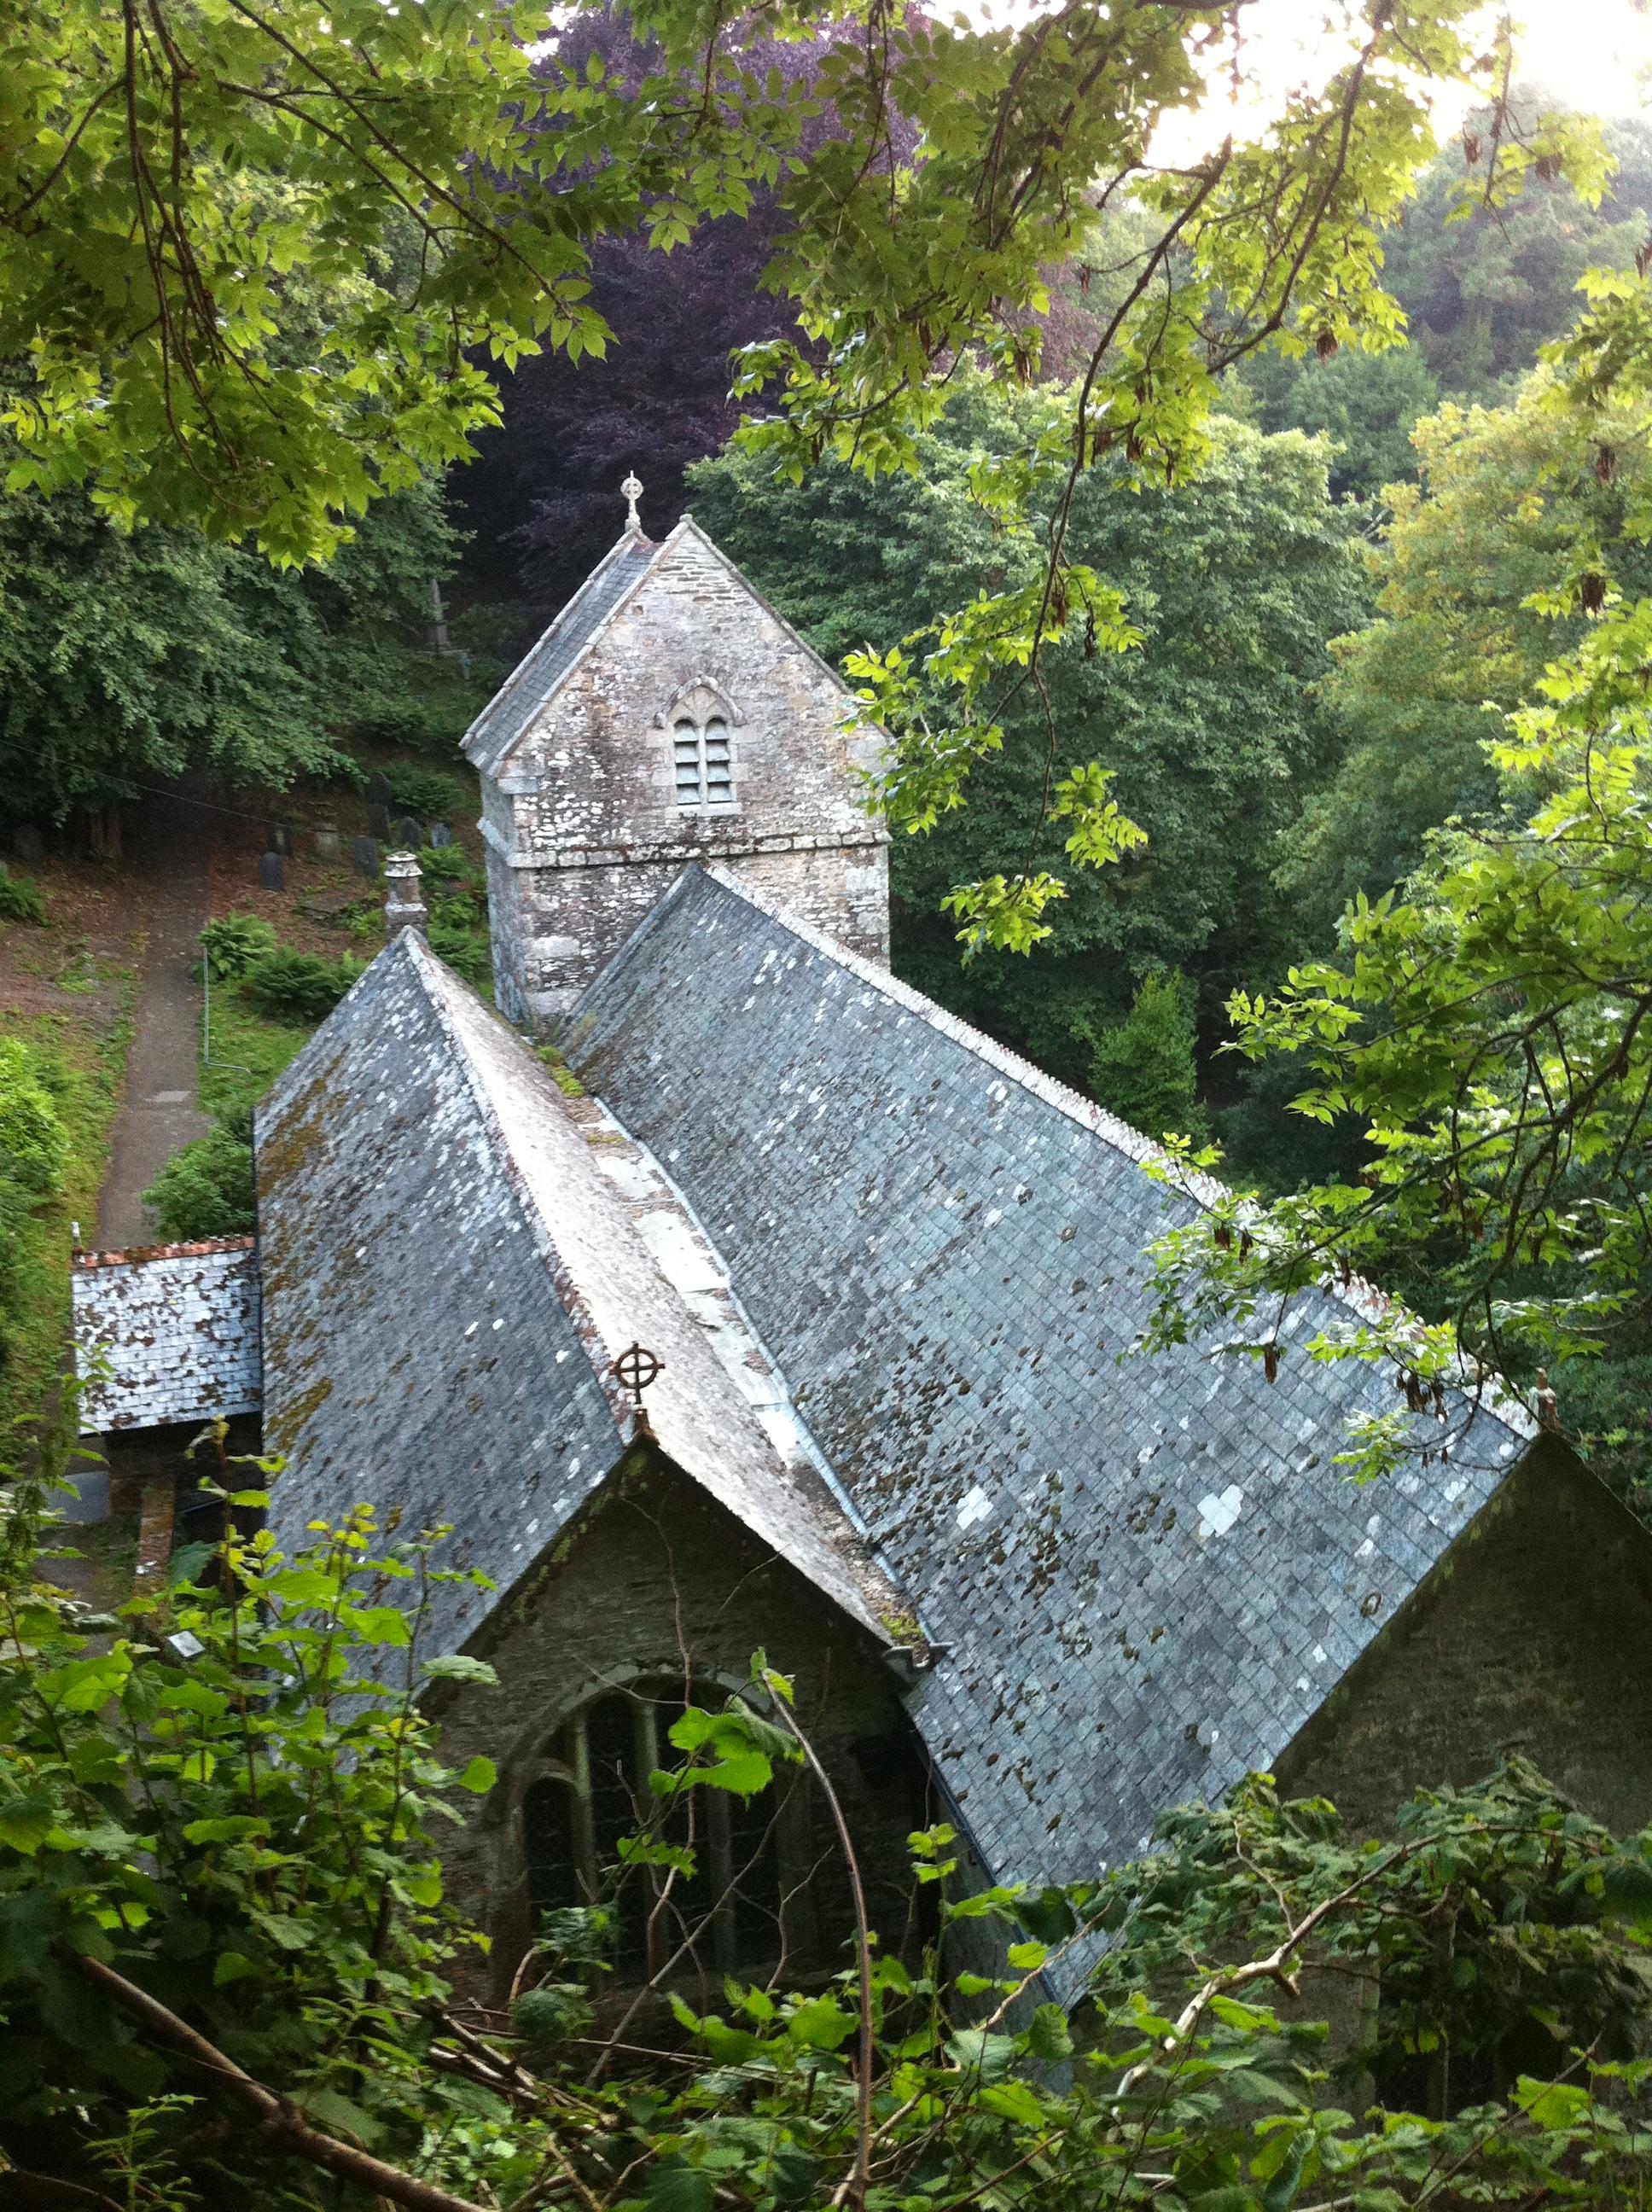 A church surveyed by B.A.T. Ecological (photo by Matt Cook)